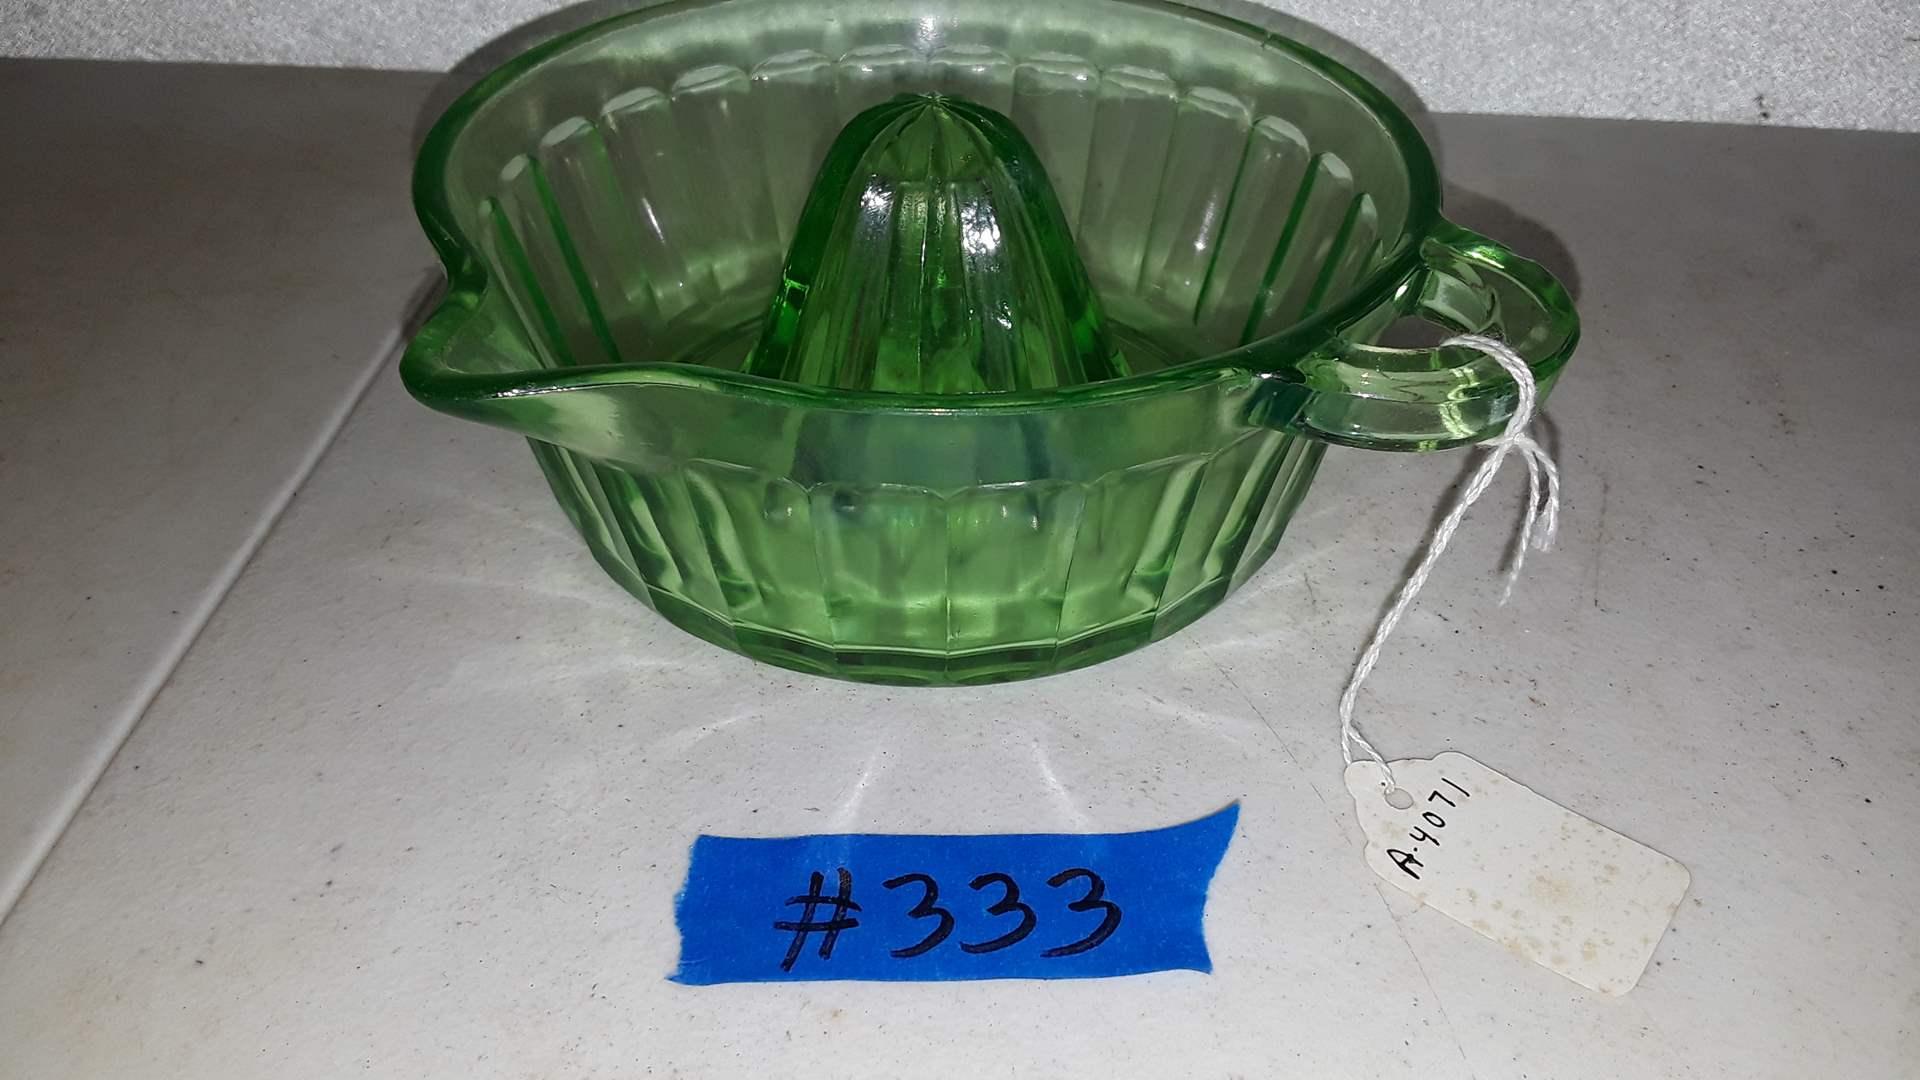 Lot # 333 ANTIQUE GREEN GLASS REAMER